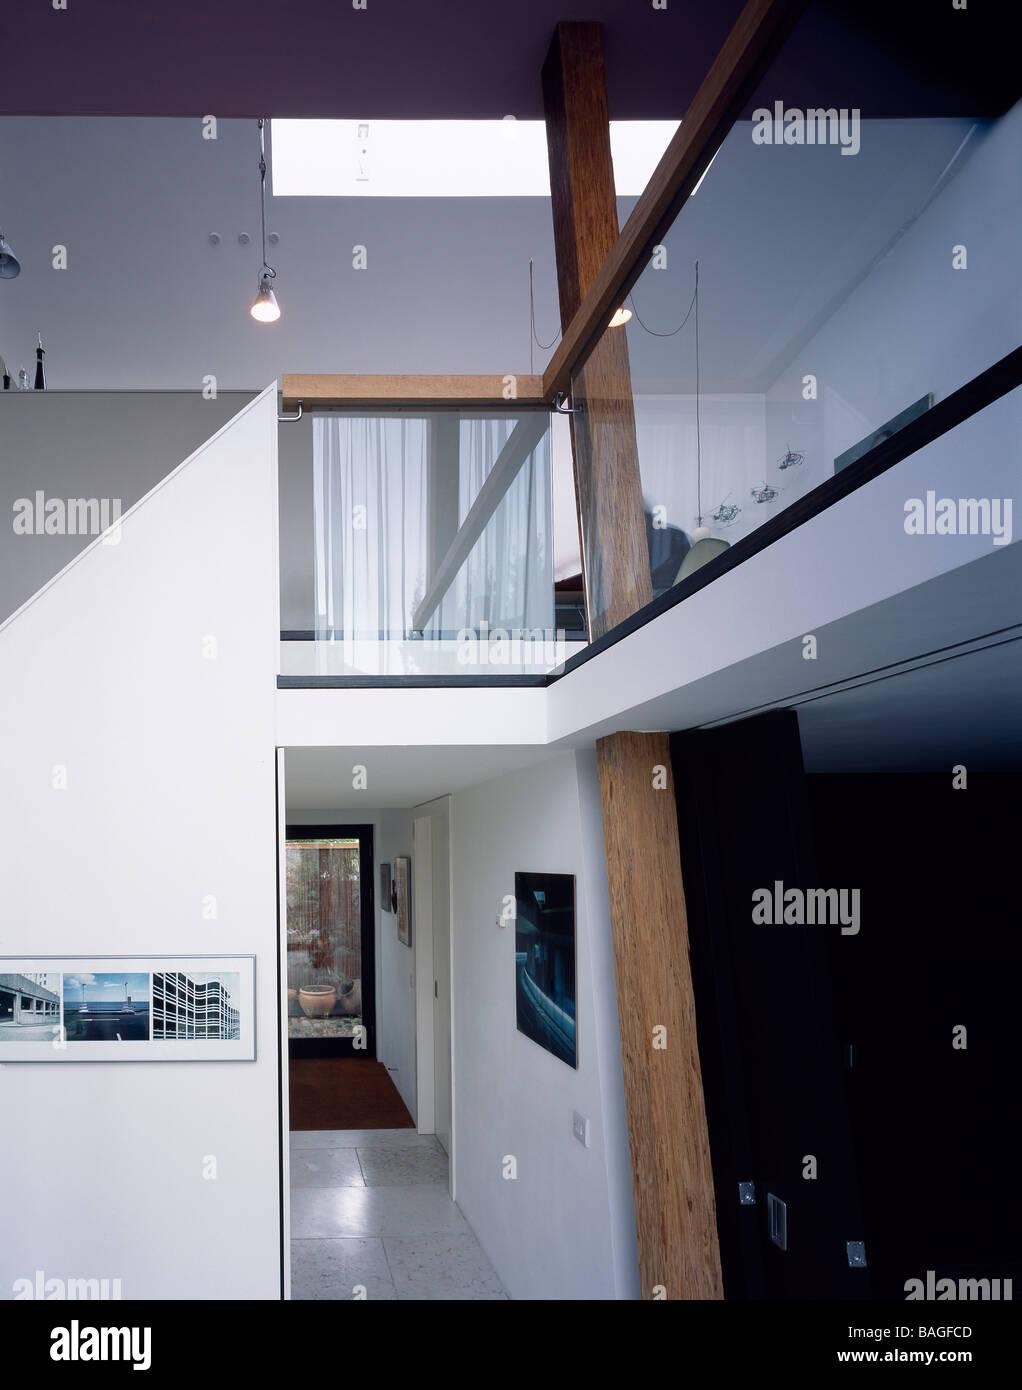 In-Between, London, United Kingdom, Annalie Riches Silvia Ullmayer and Barti Garibaldo, In-between ground level - Stock Image